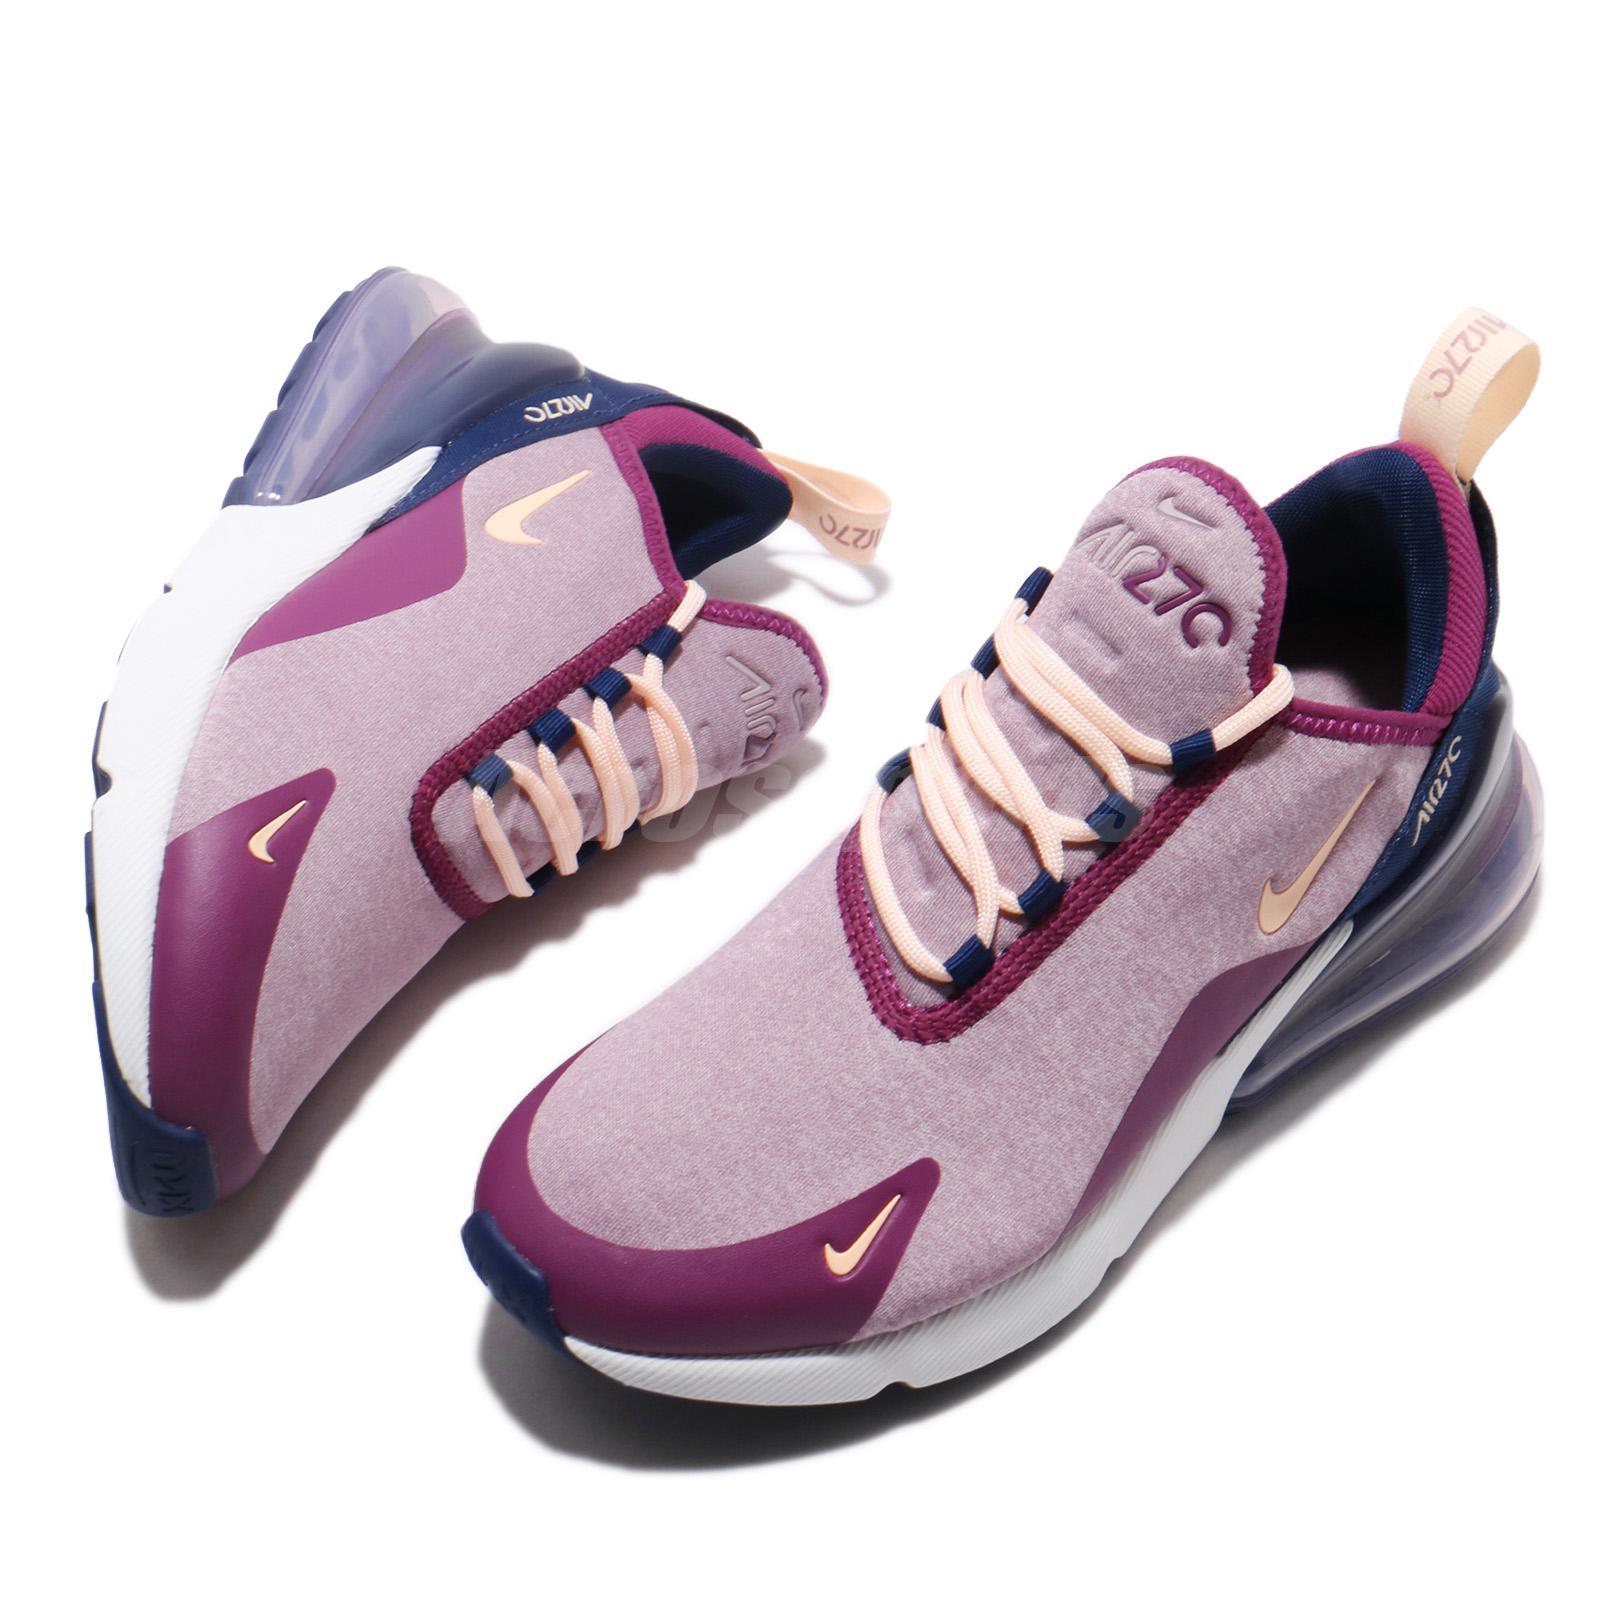 26bfd686bfe19 Nike Wmns Air Max 270 SE Plum Chalk Crimson Tint Women Running Shoes ...